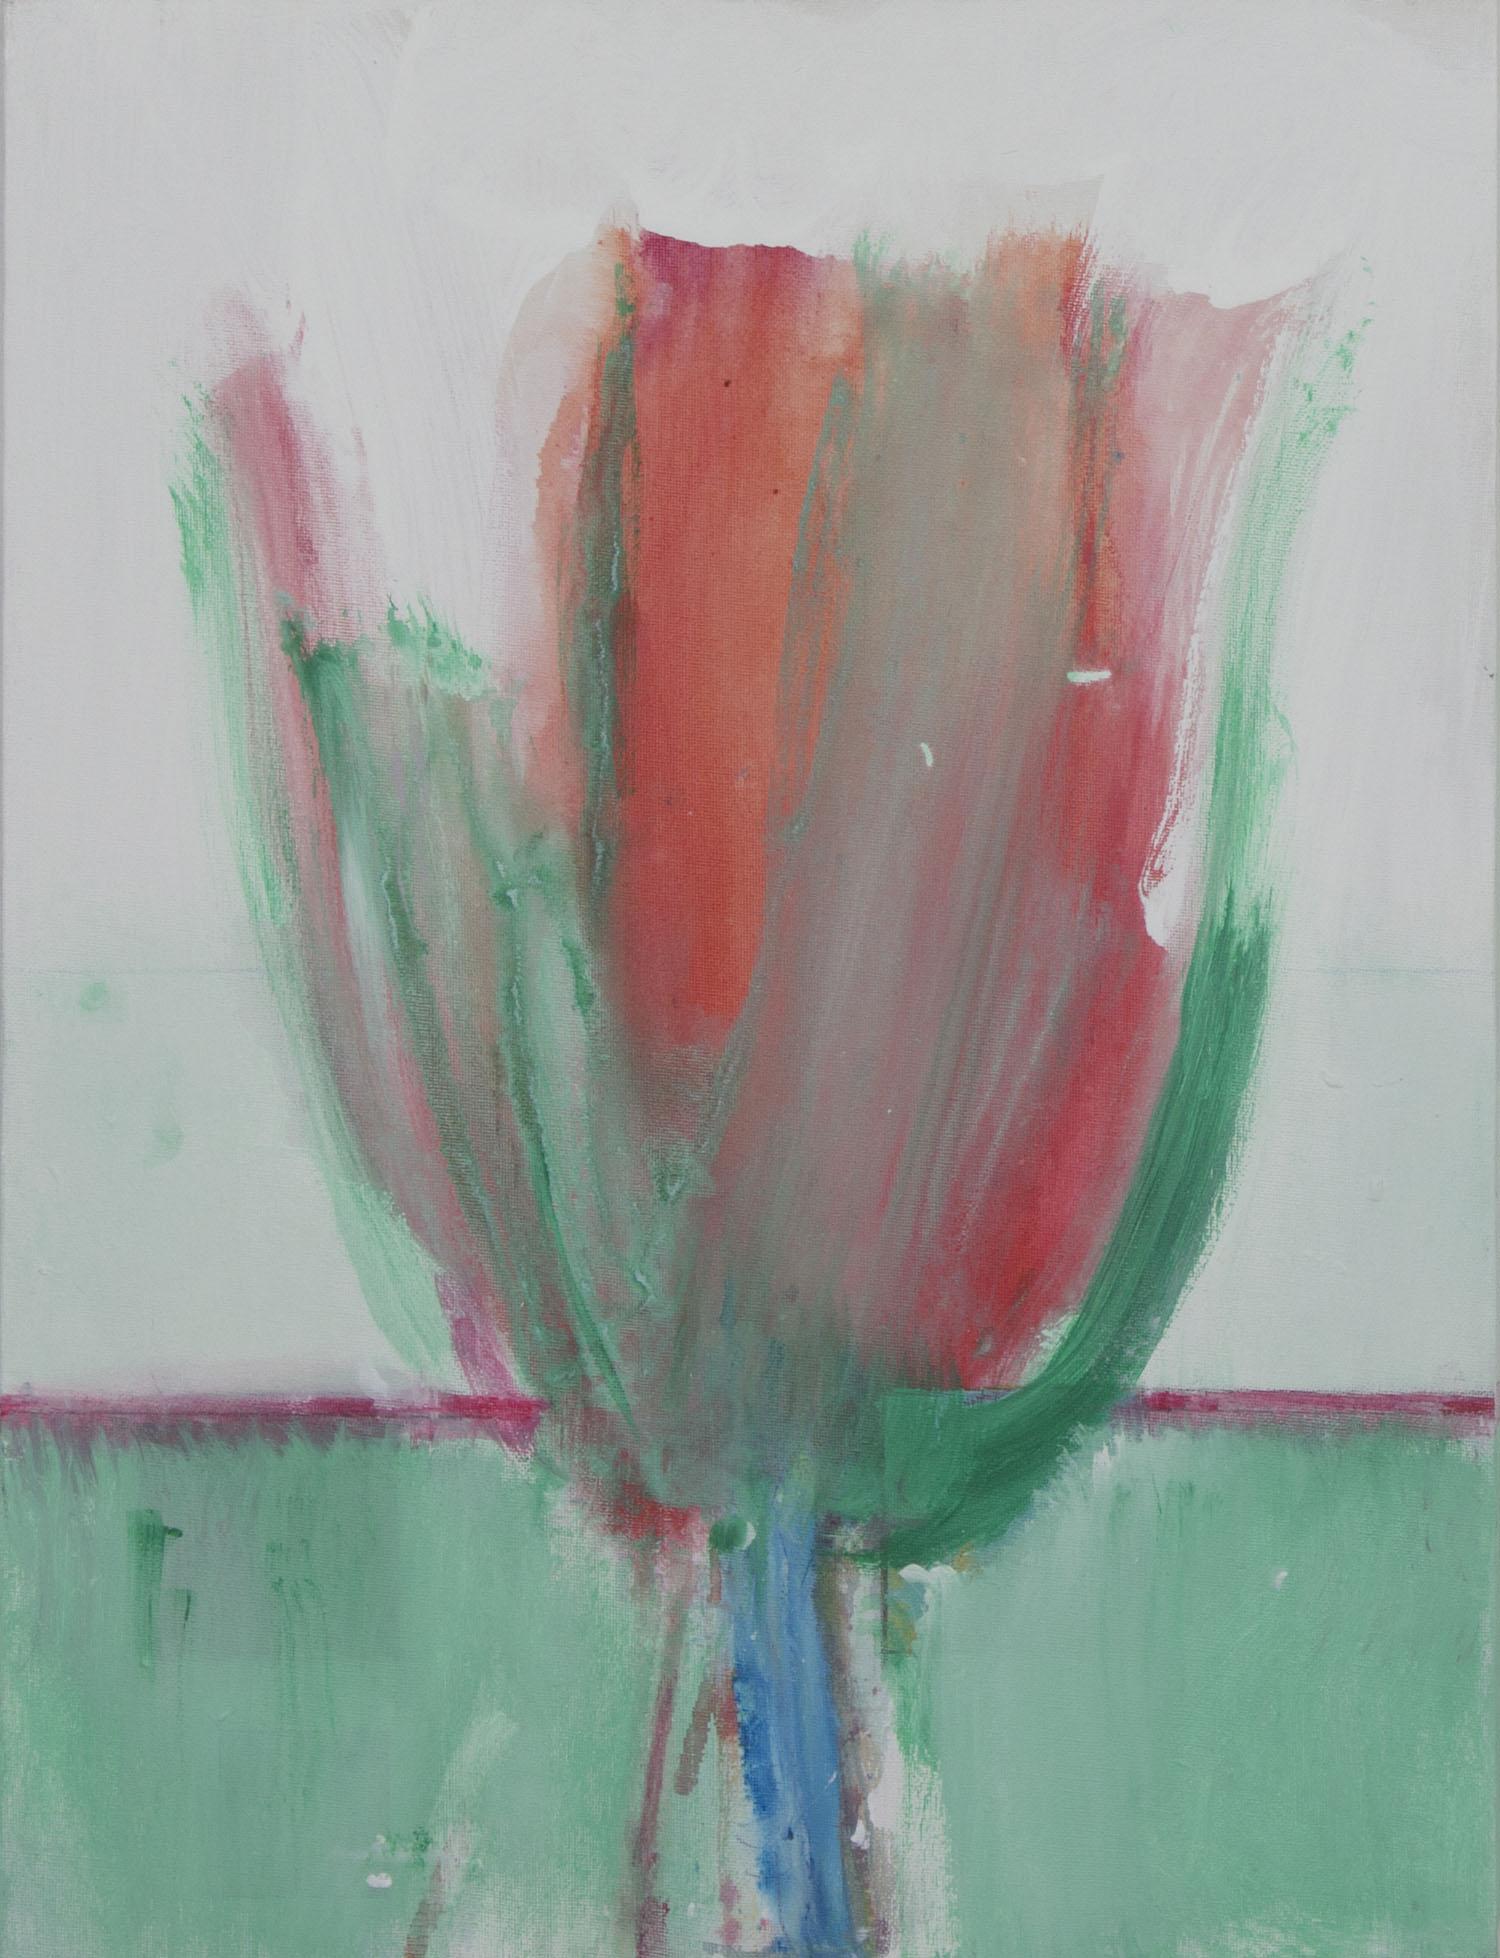 Robert Janz 'Inflowing 1' acrylic on canvas 60x46cm.jpg